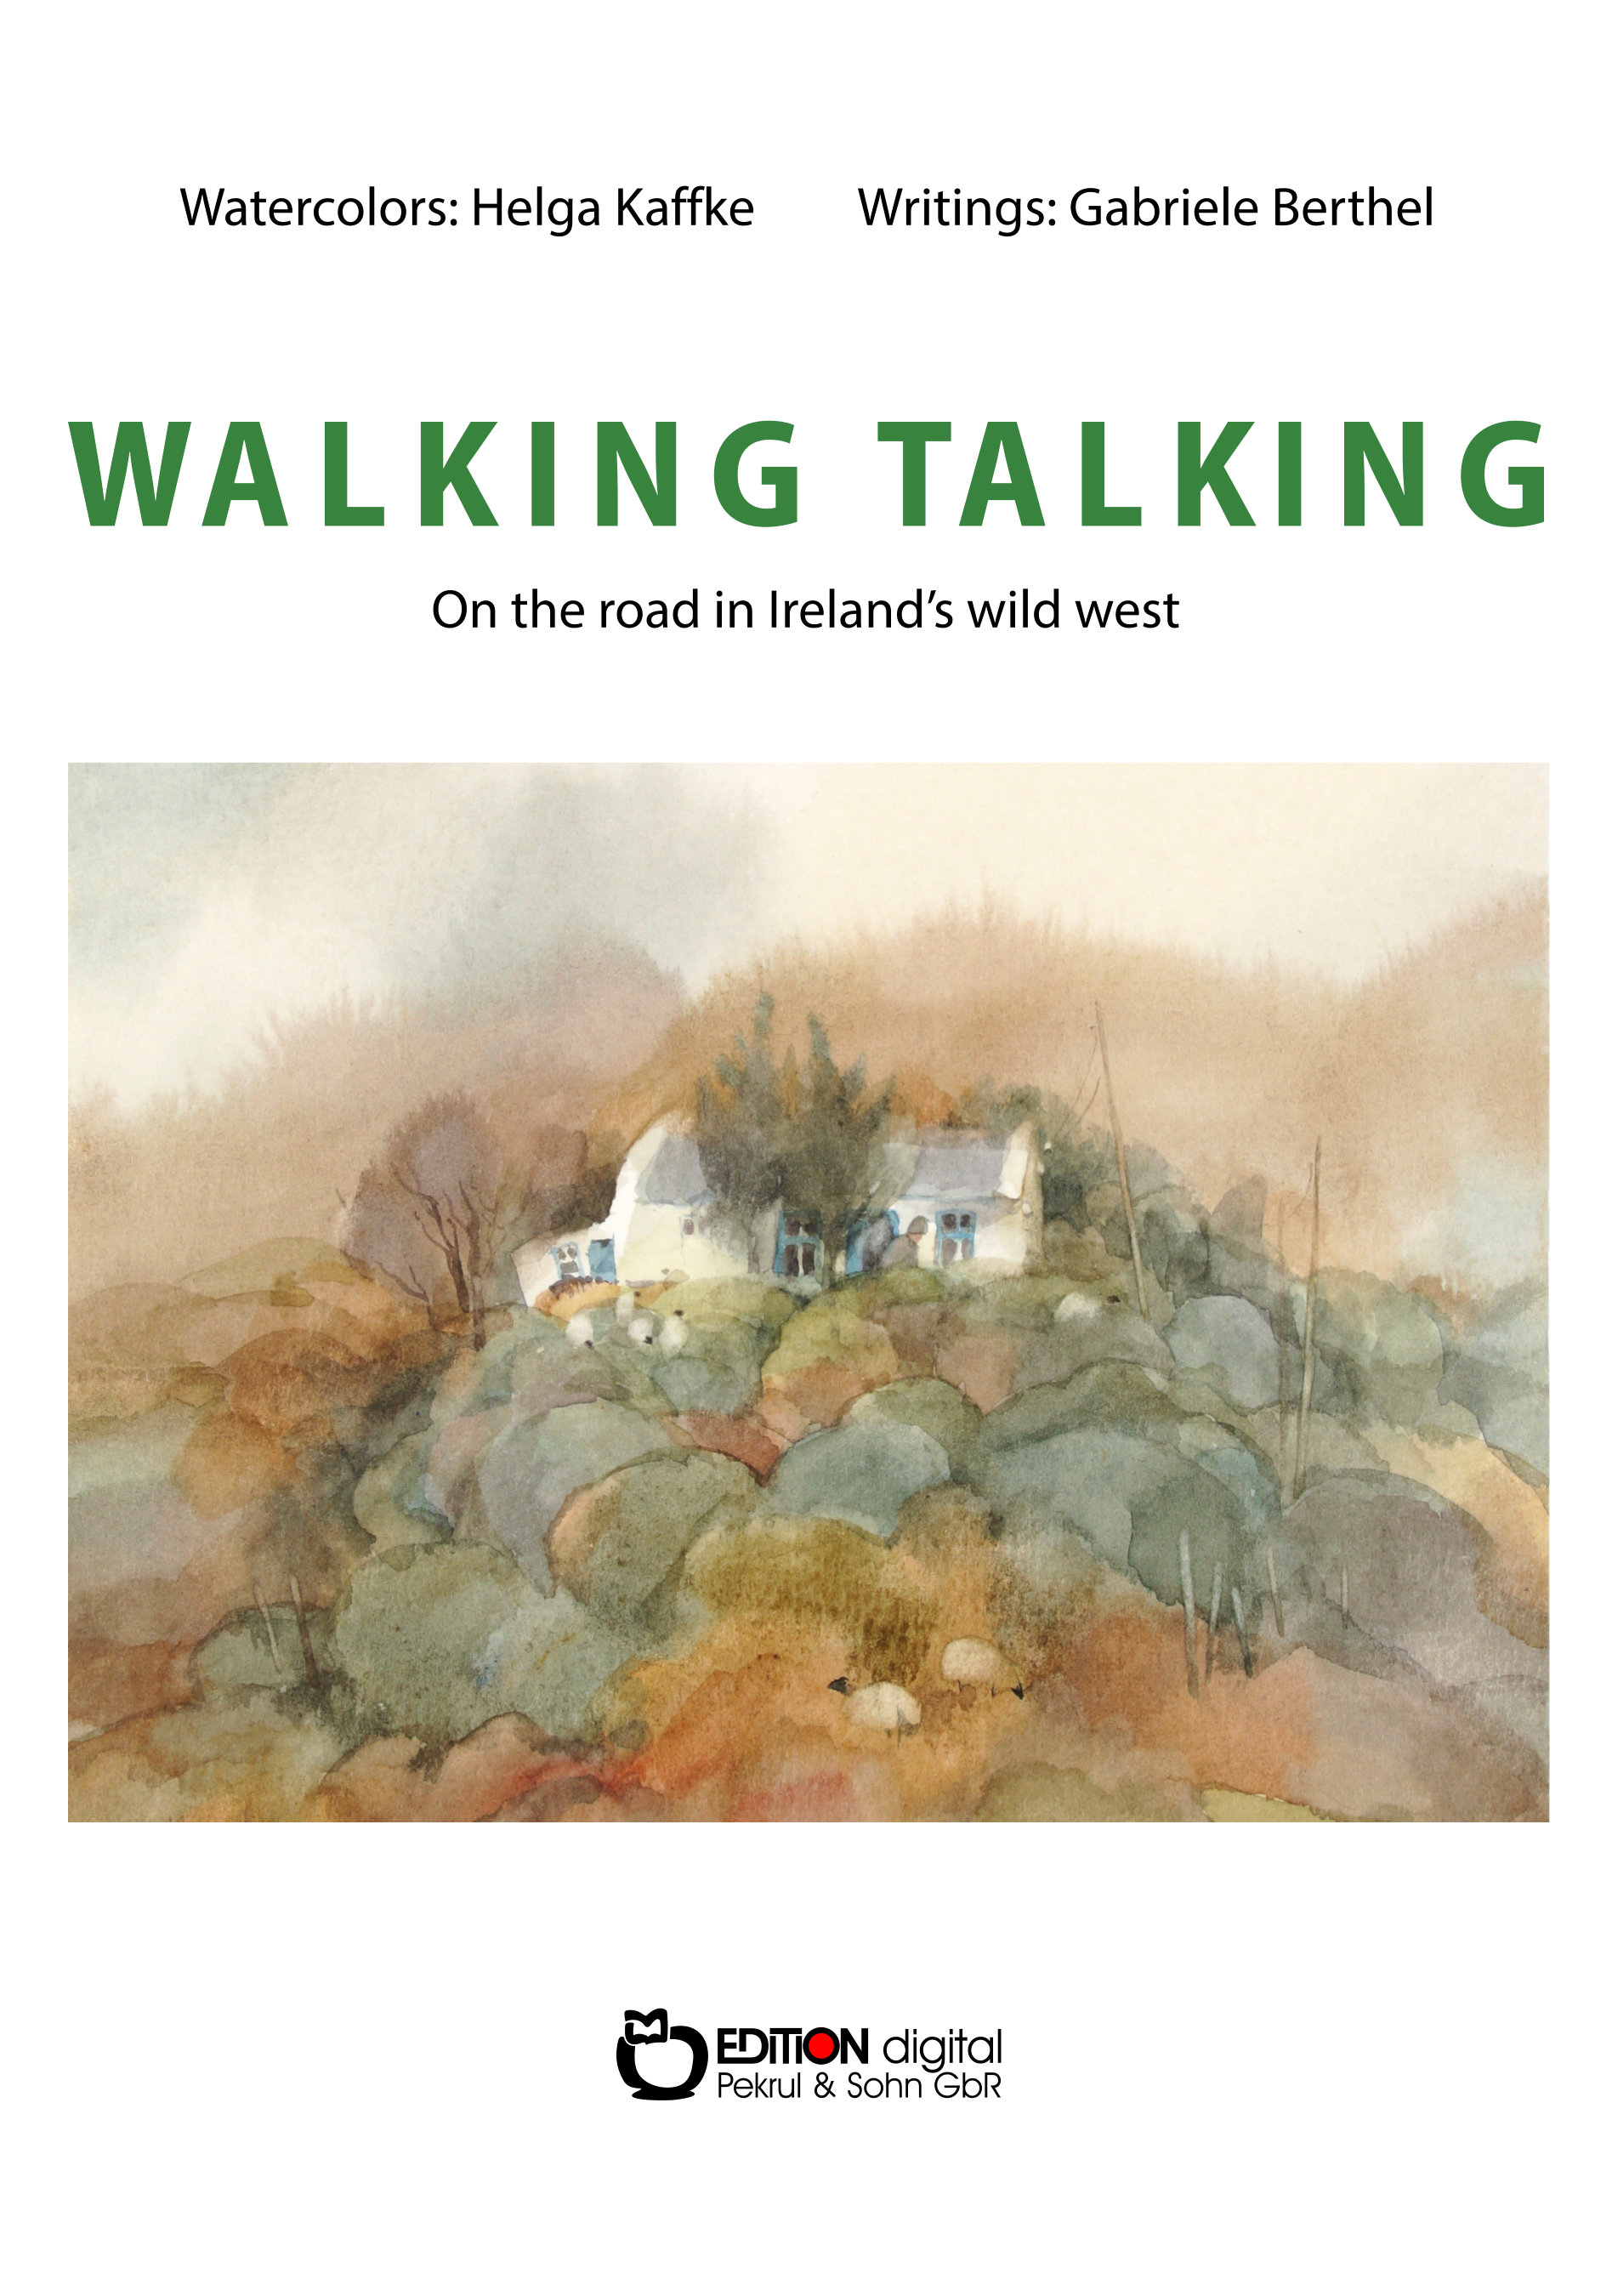 WALKING TALKING. On the road in Ireland's wild west von Gabriele Berthel, Helga Kaffke (Illustrator)